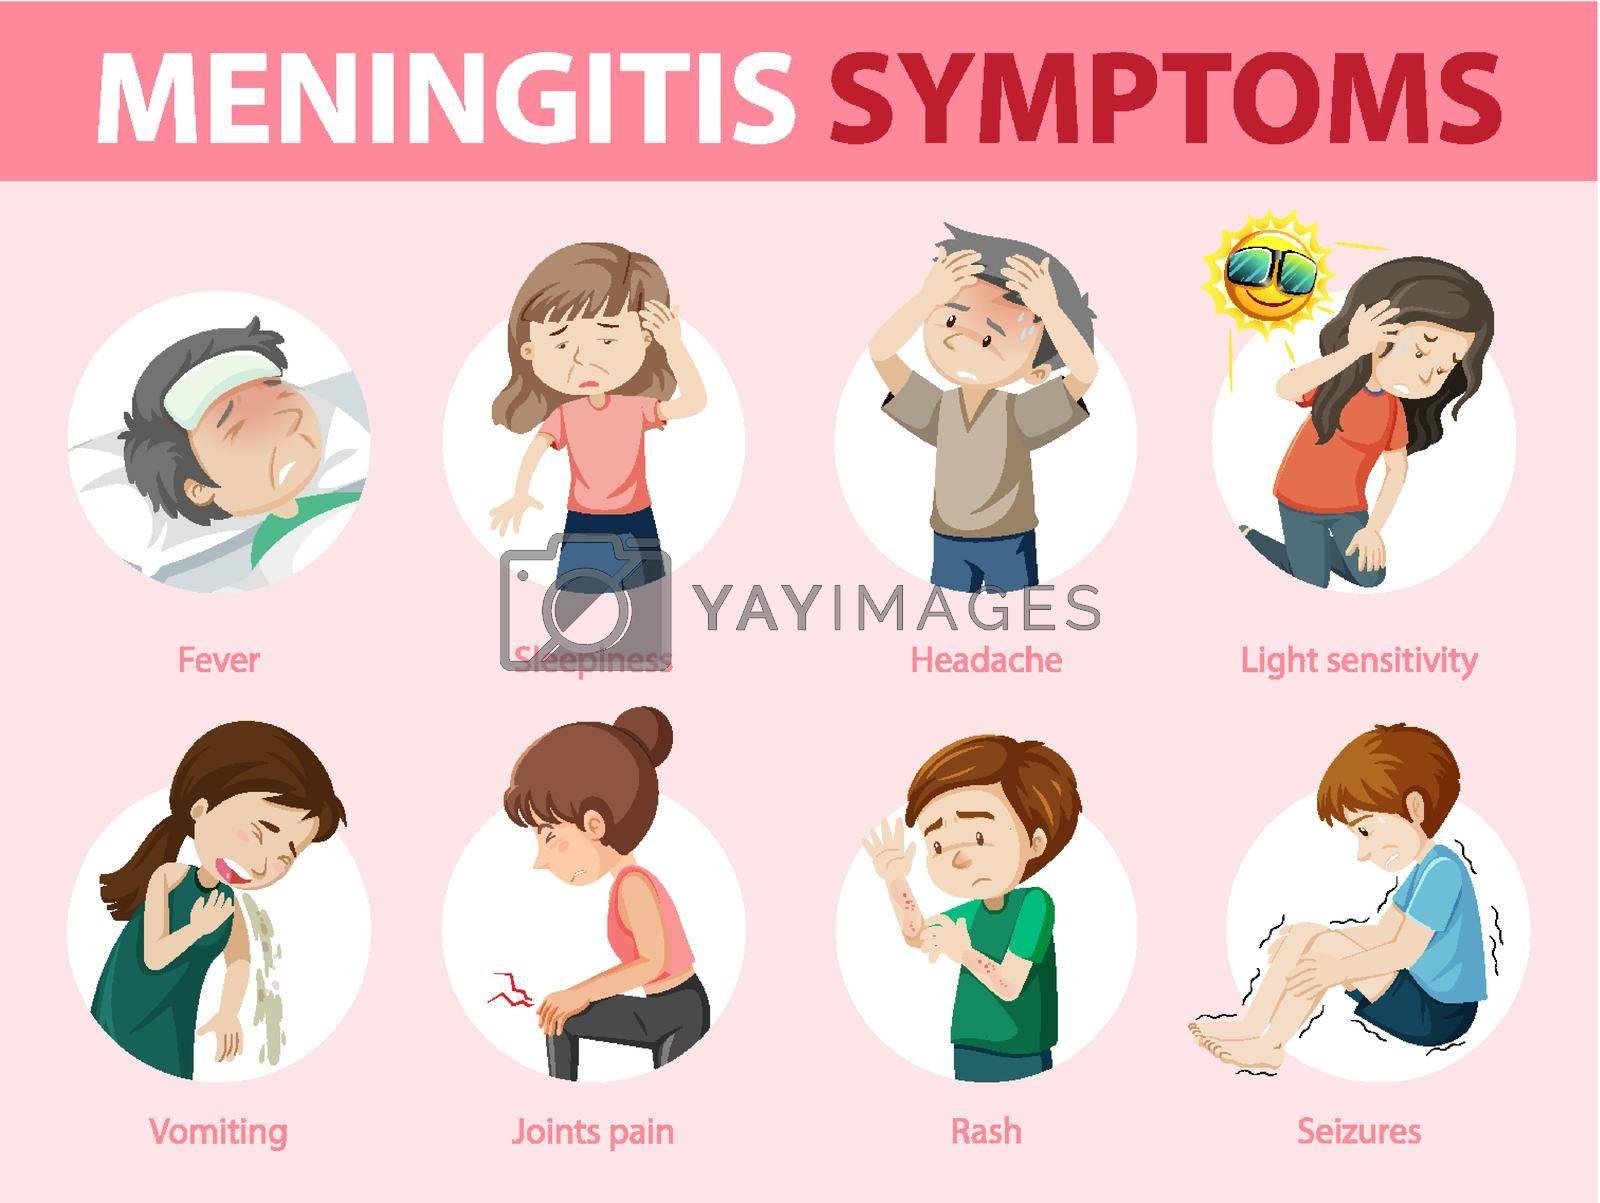 Meningitis symptoms warning sign infographic illustration